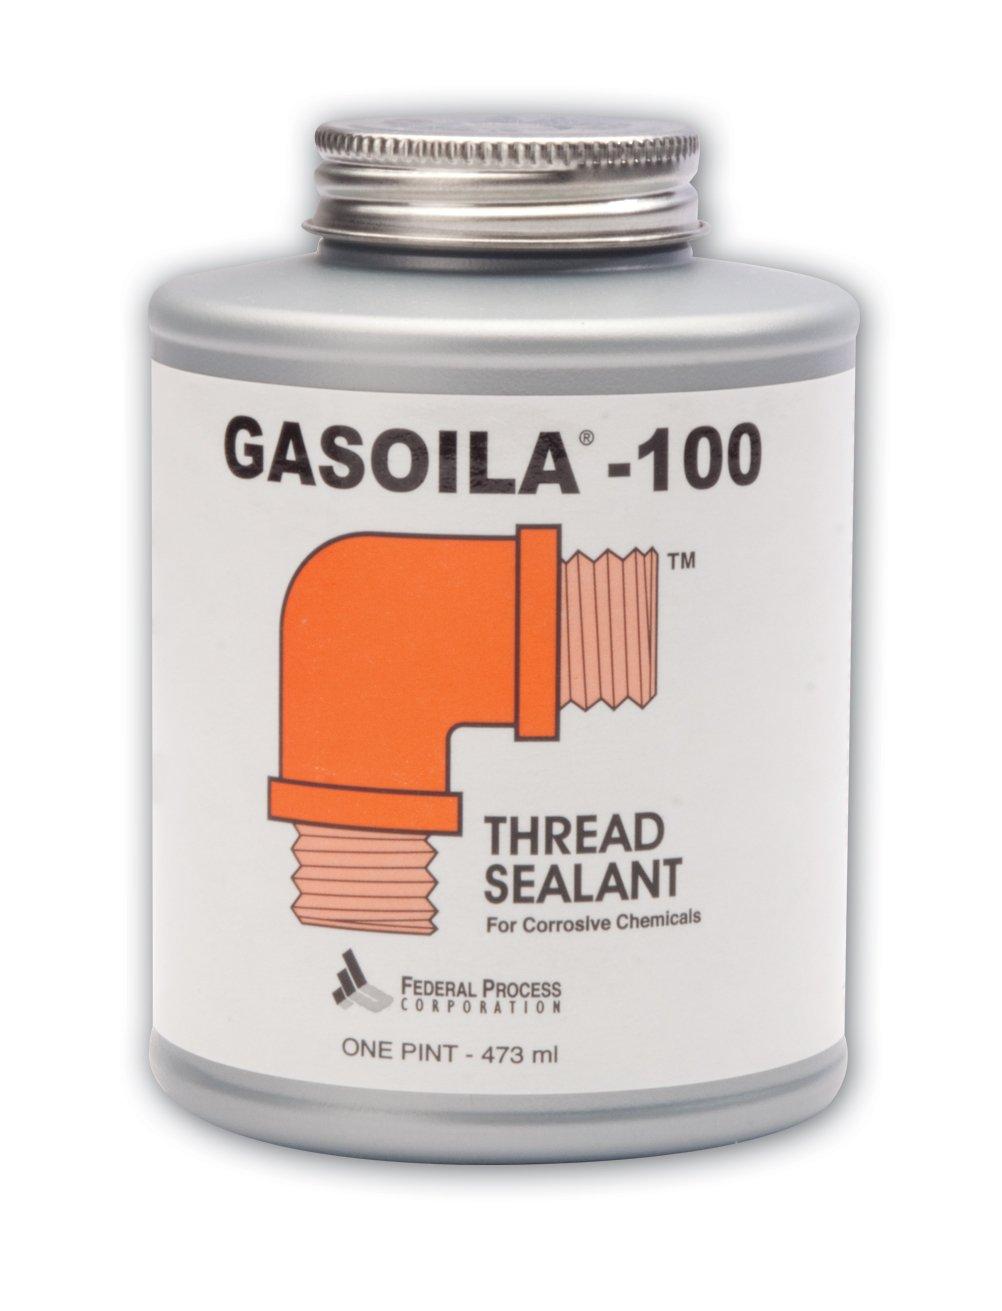 Gasoila 100 Soft-Set Thread Sealant, -50 to 450 Degree F, For Corrosive Chemicals, 1/4 Pint Brush